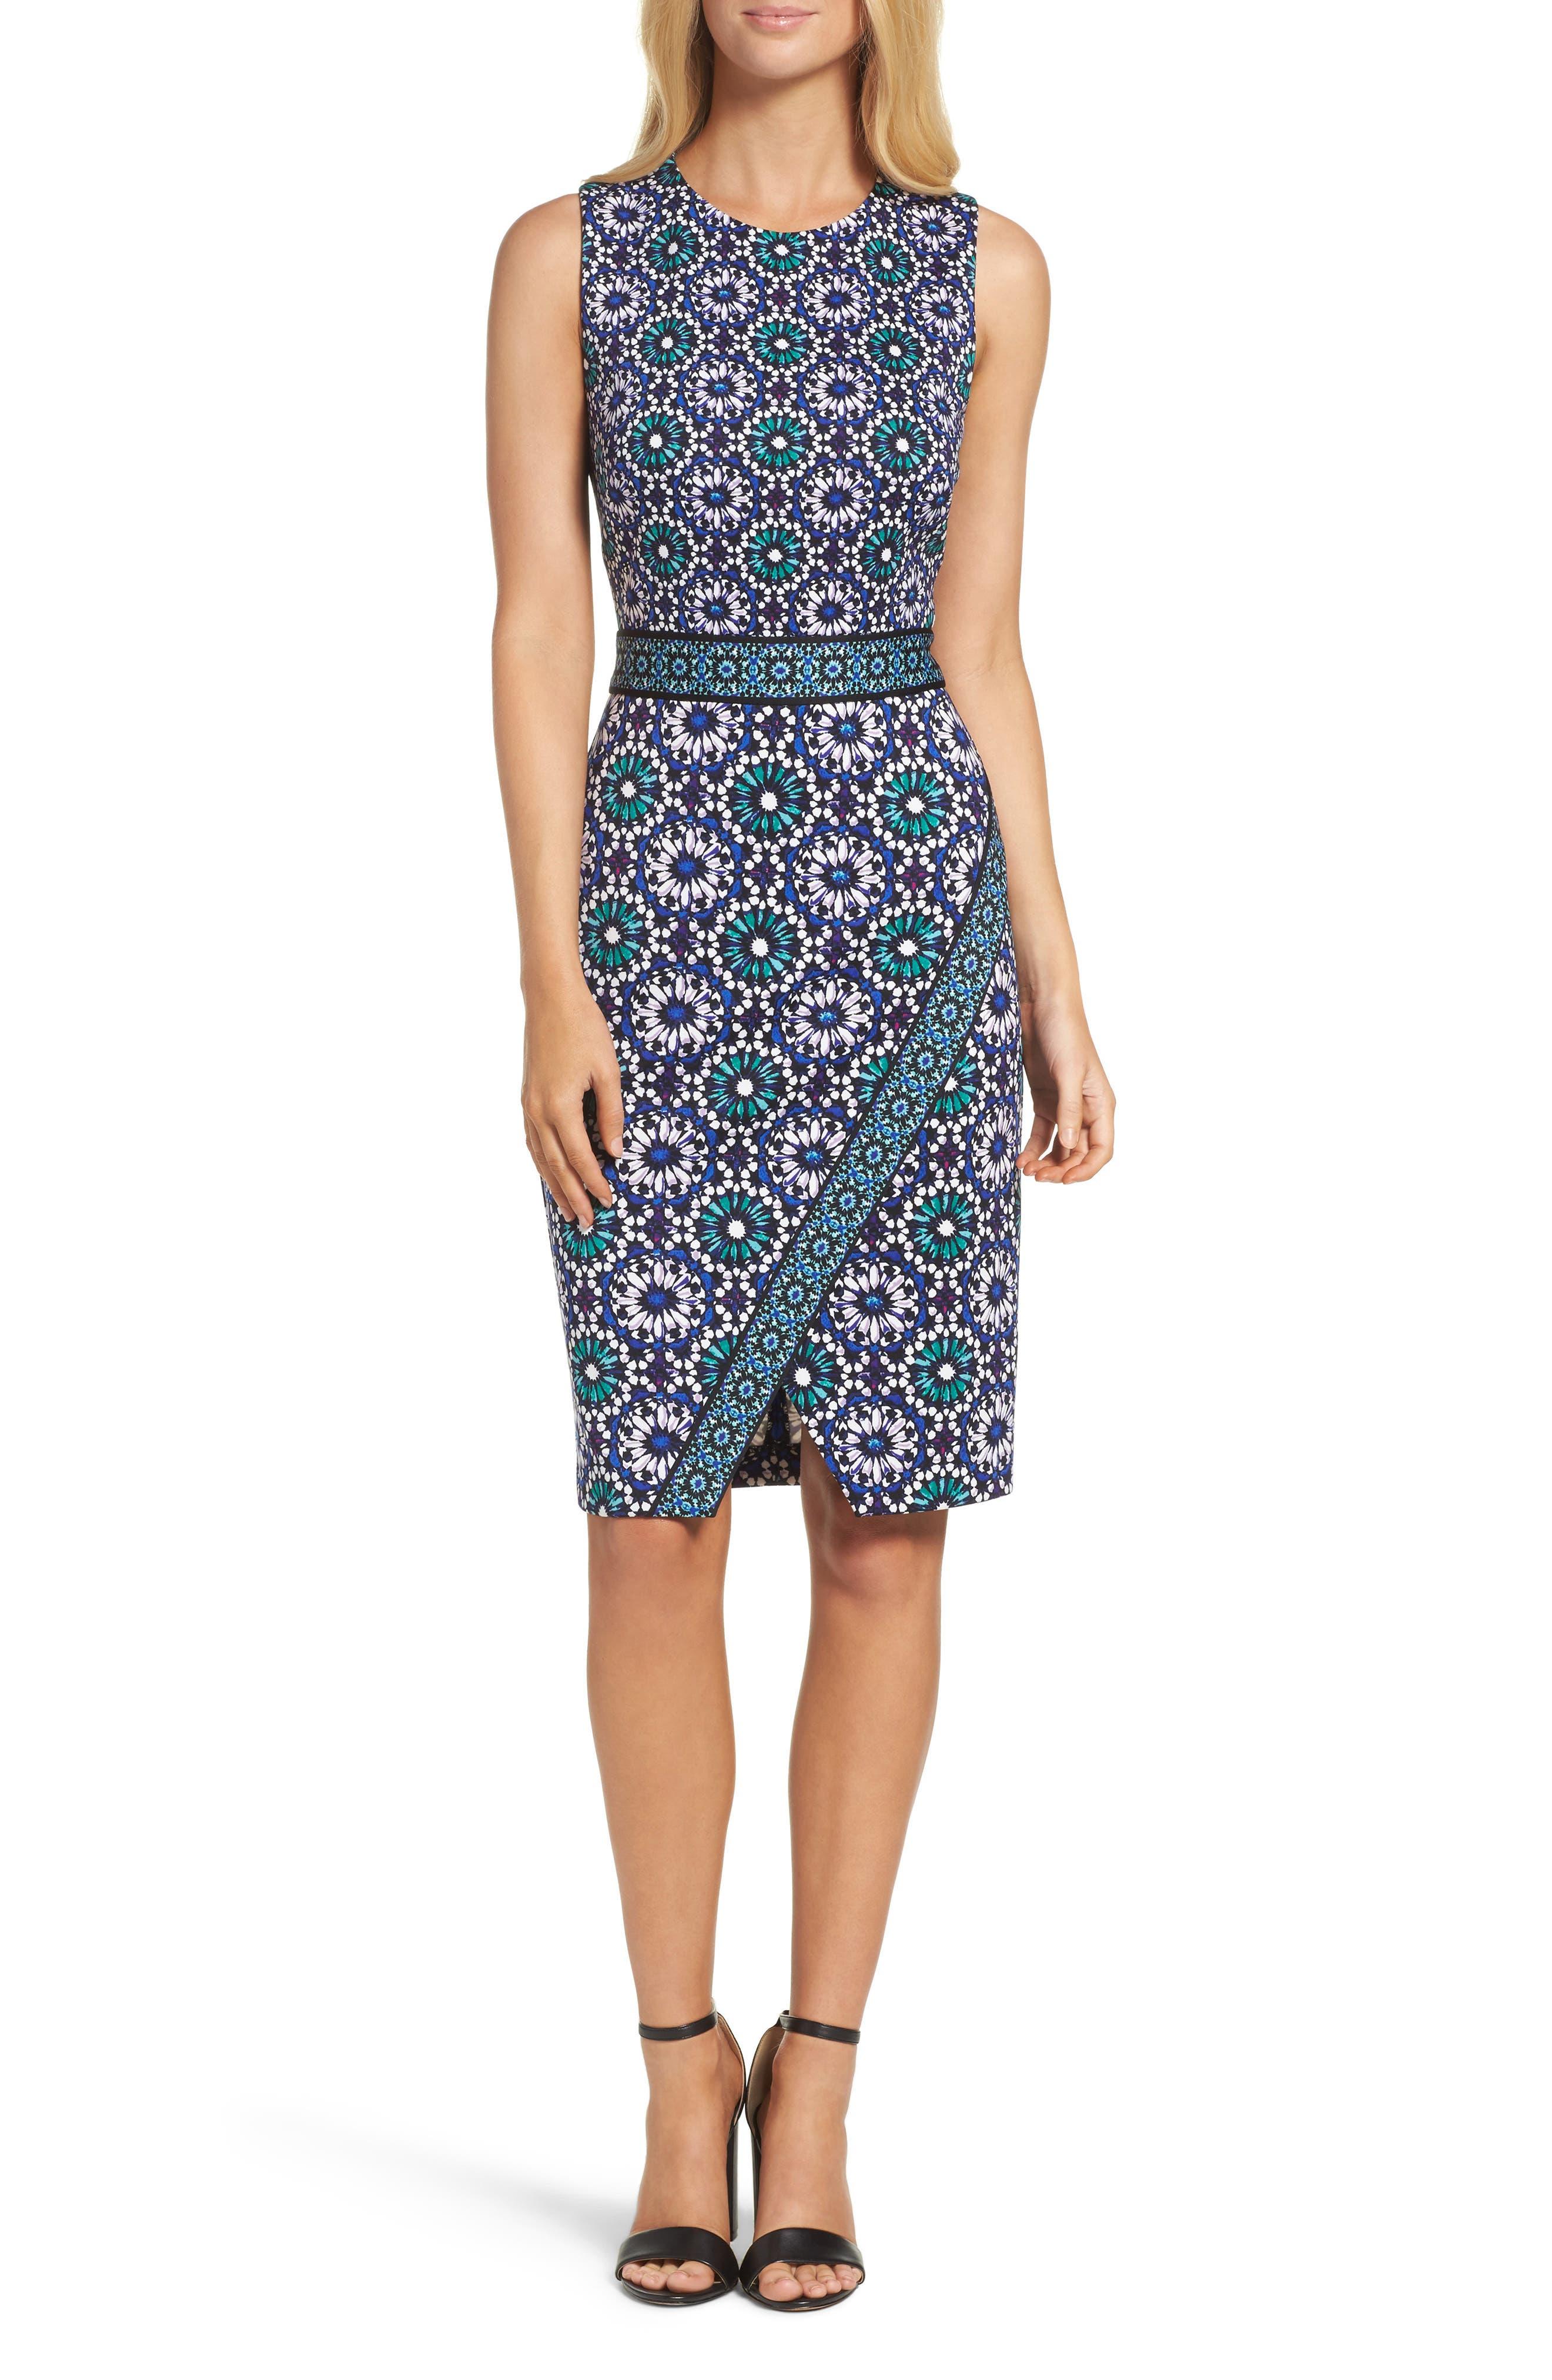 Maggy London Jewel Tile Jersey Sheath Dress